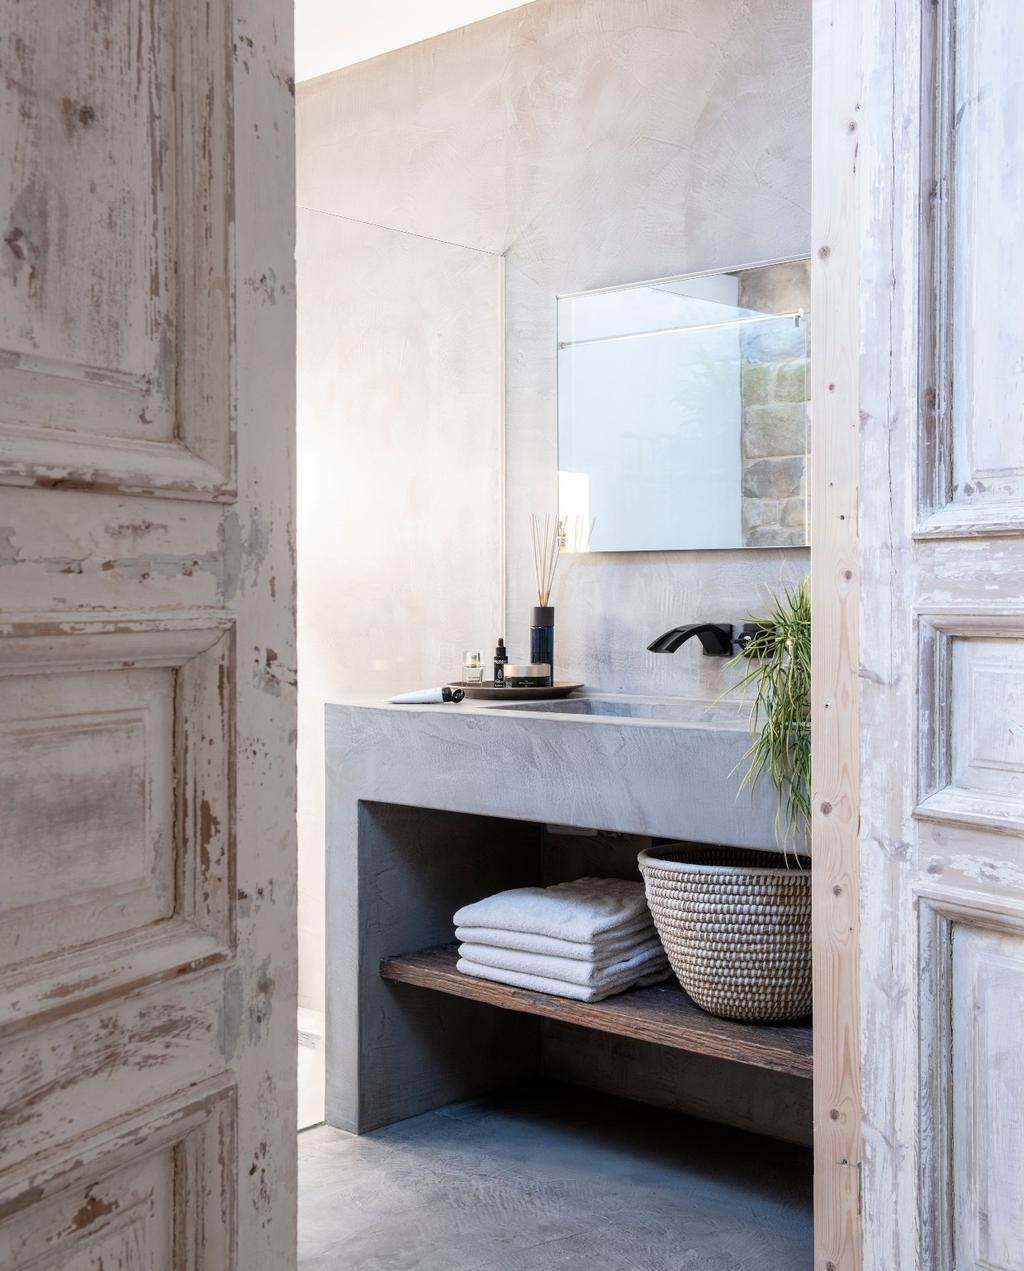 vtwonen bk special 03-2020 | binnenkijken Almere badkamer wastafelmeubel beton